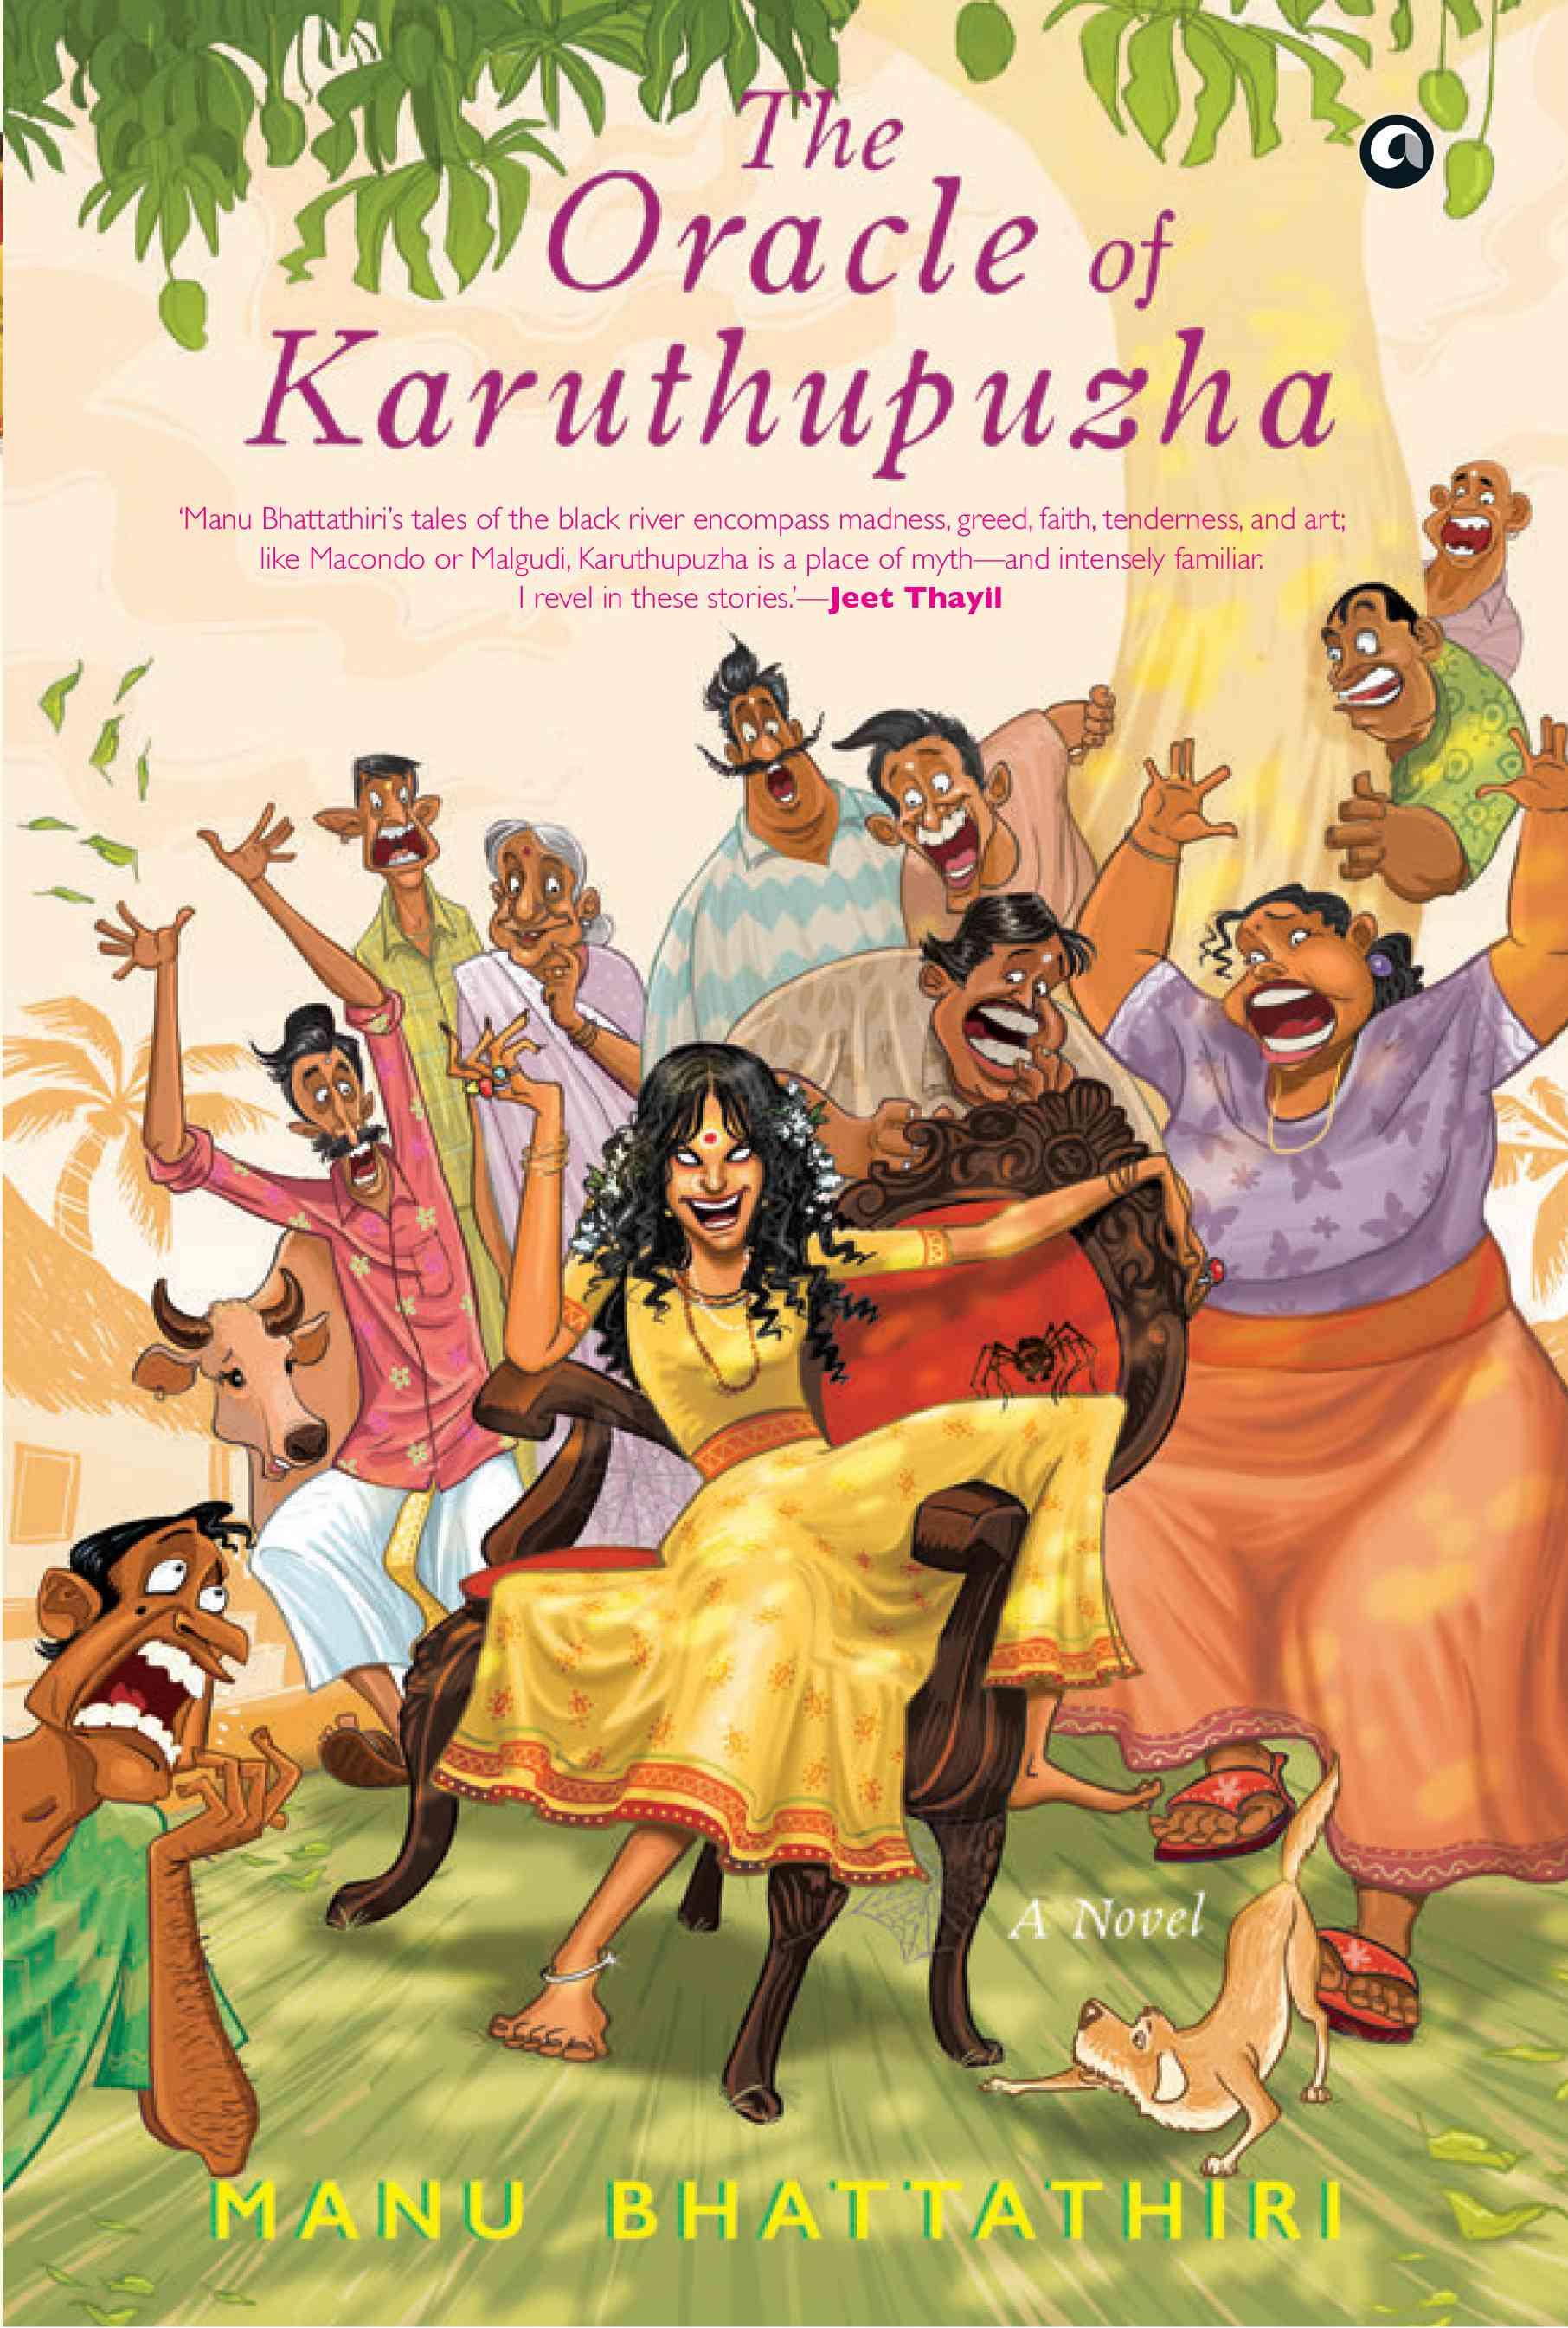 The Oracle of Karuthupuzha